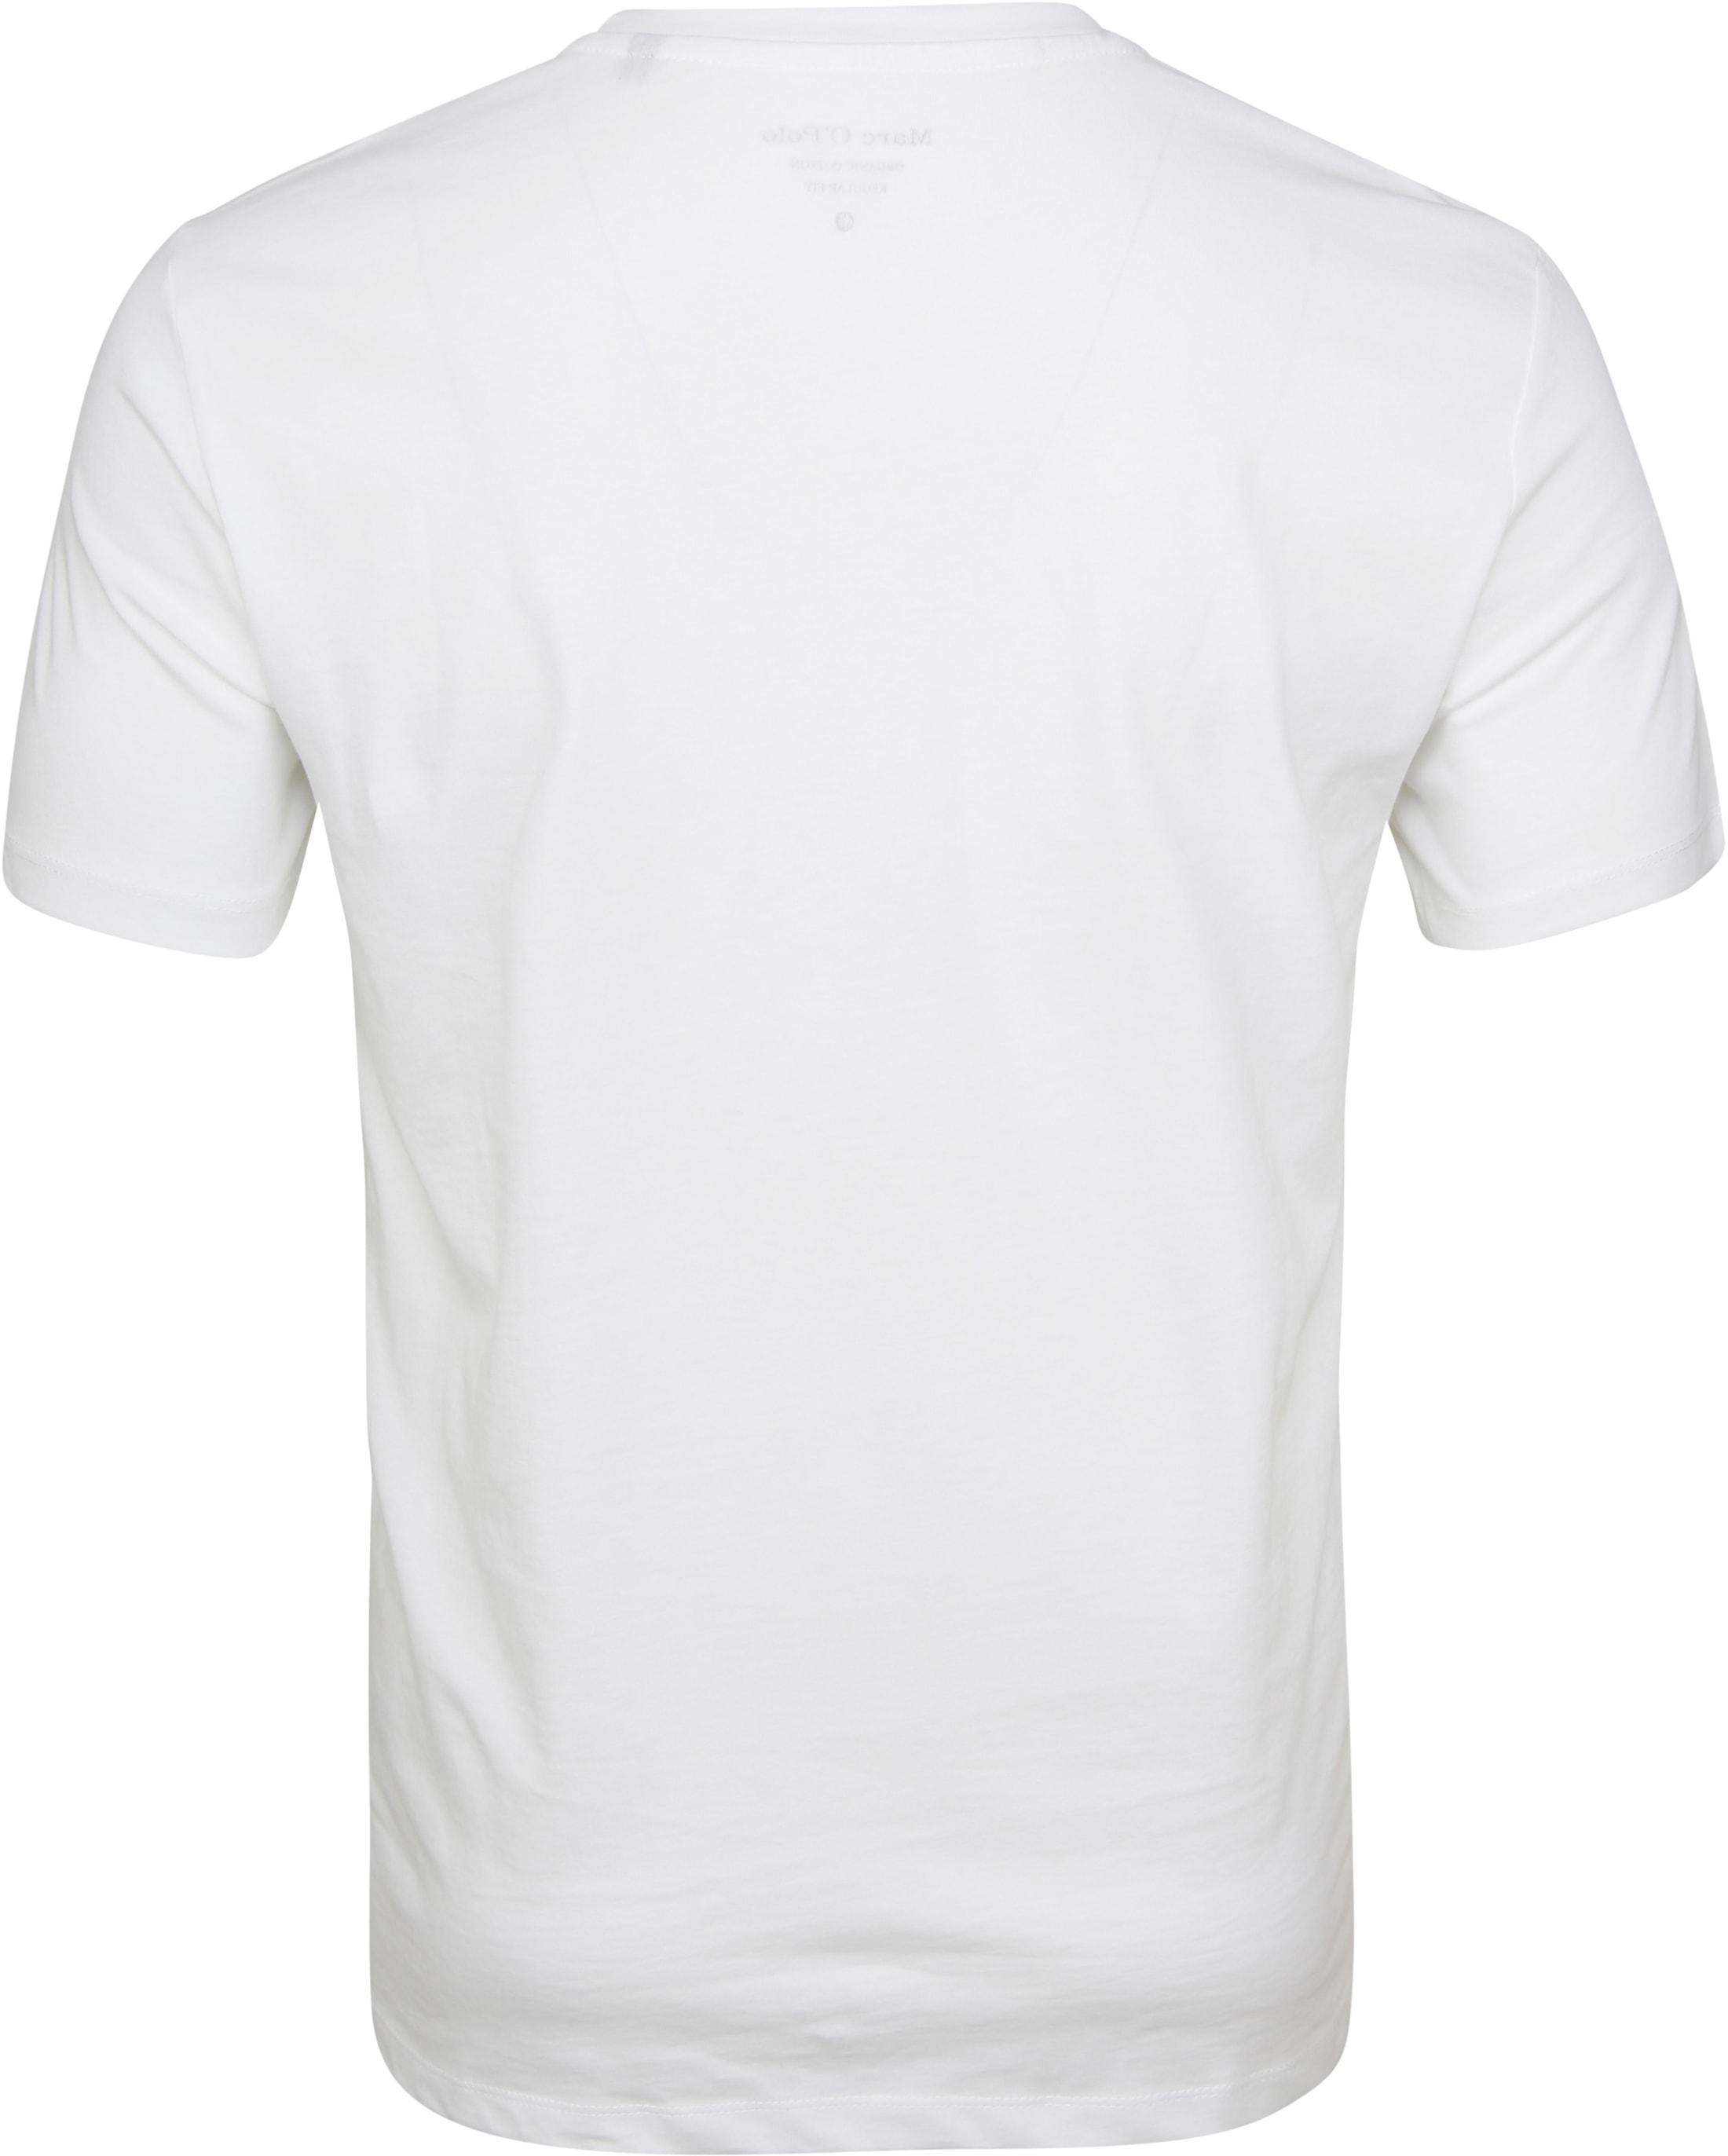 Marc O'Polo T-Shirt Nature White foto 2